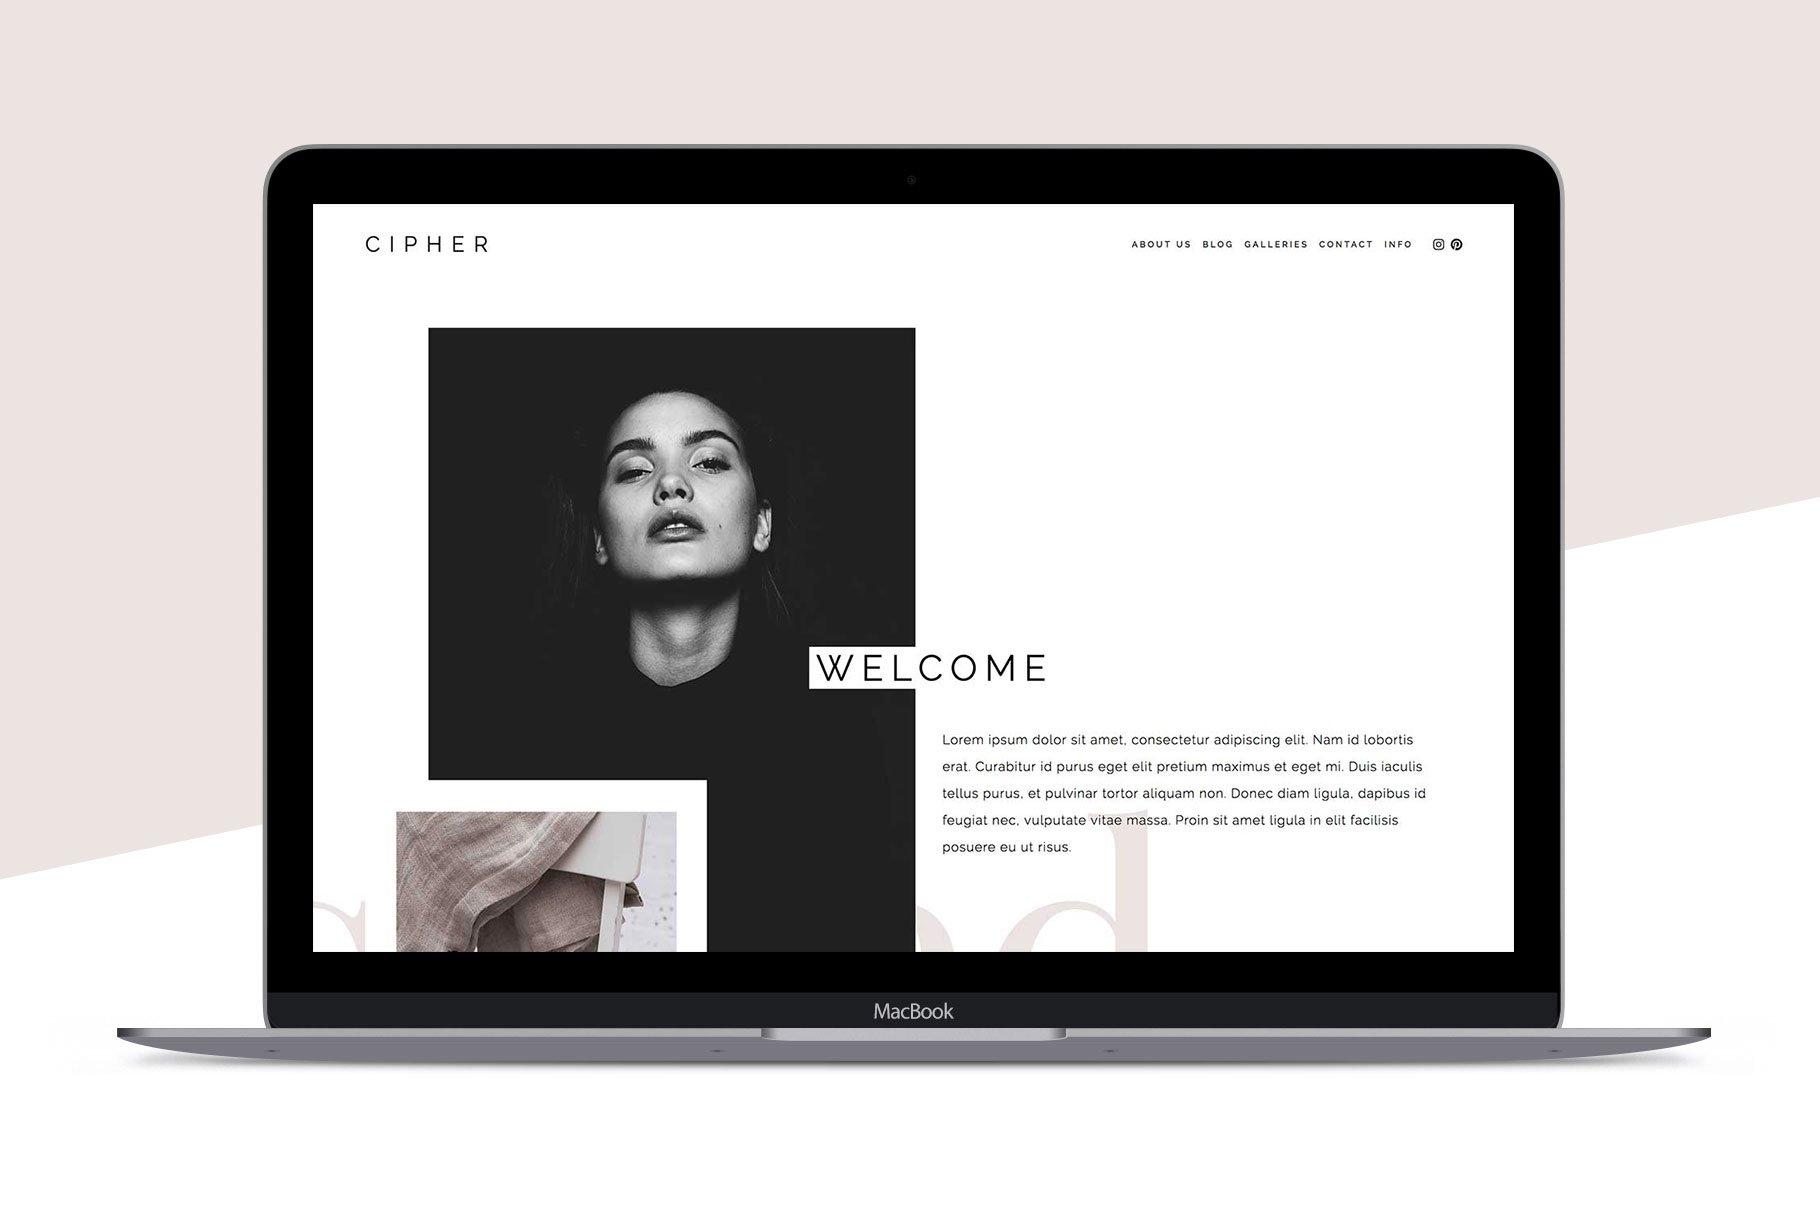 squarespace template cipher website templates. Black Bedroom Furniture Sets. Home Design Ideas